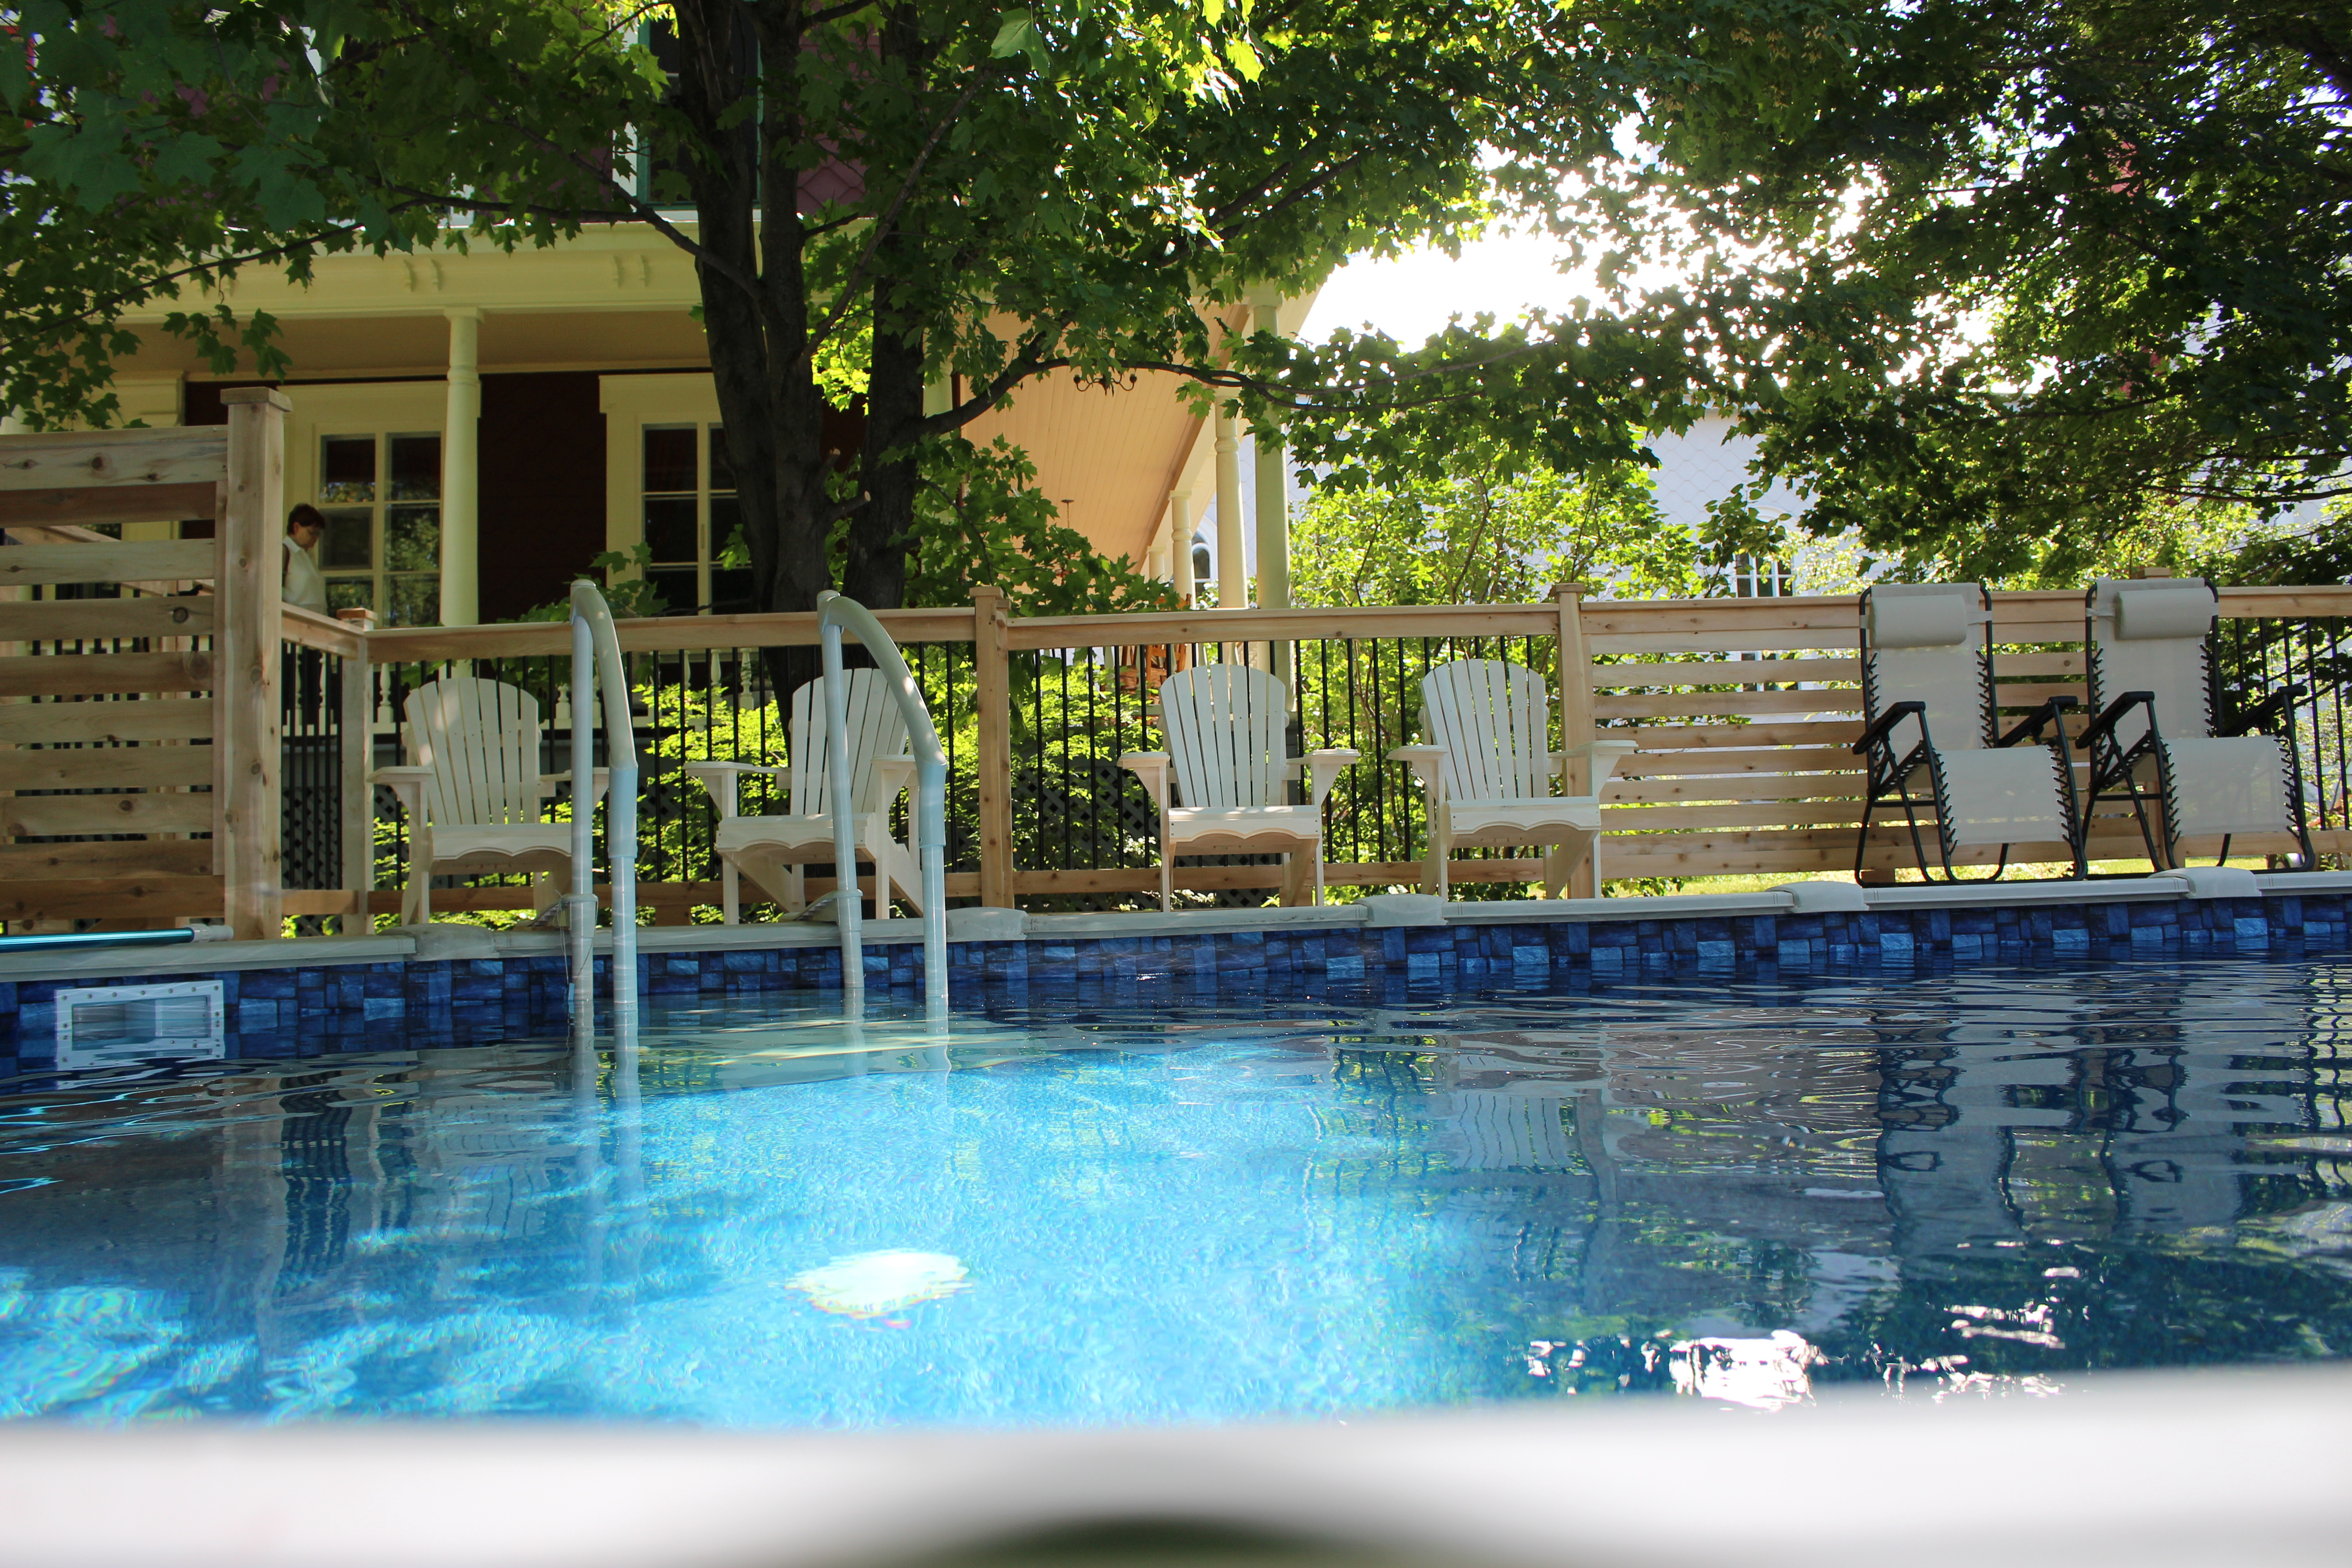 piscine chauffée au sel